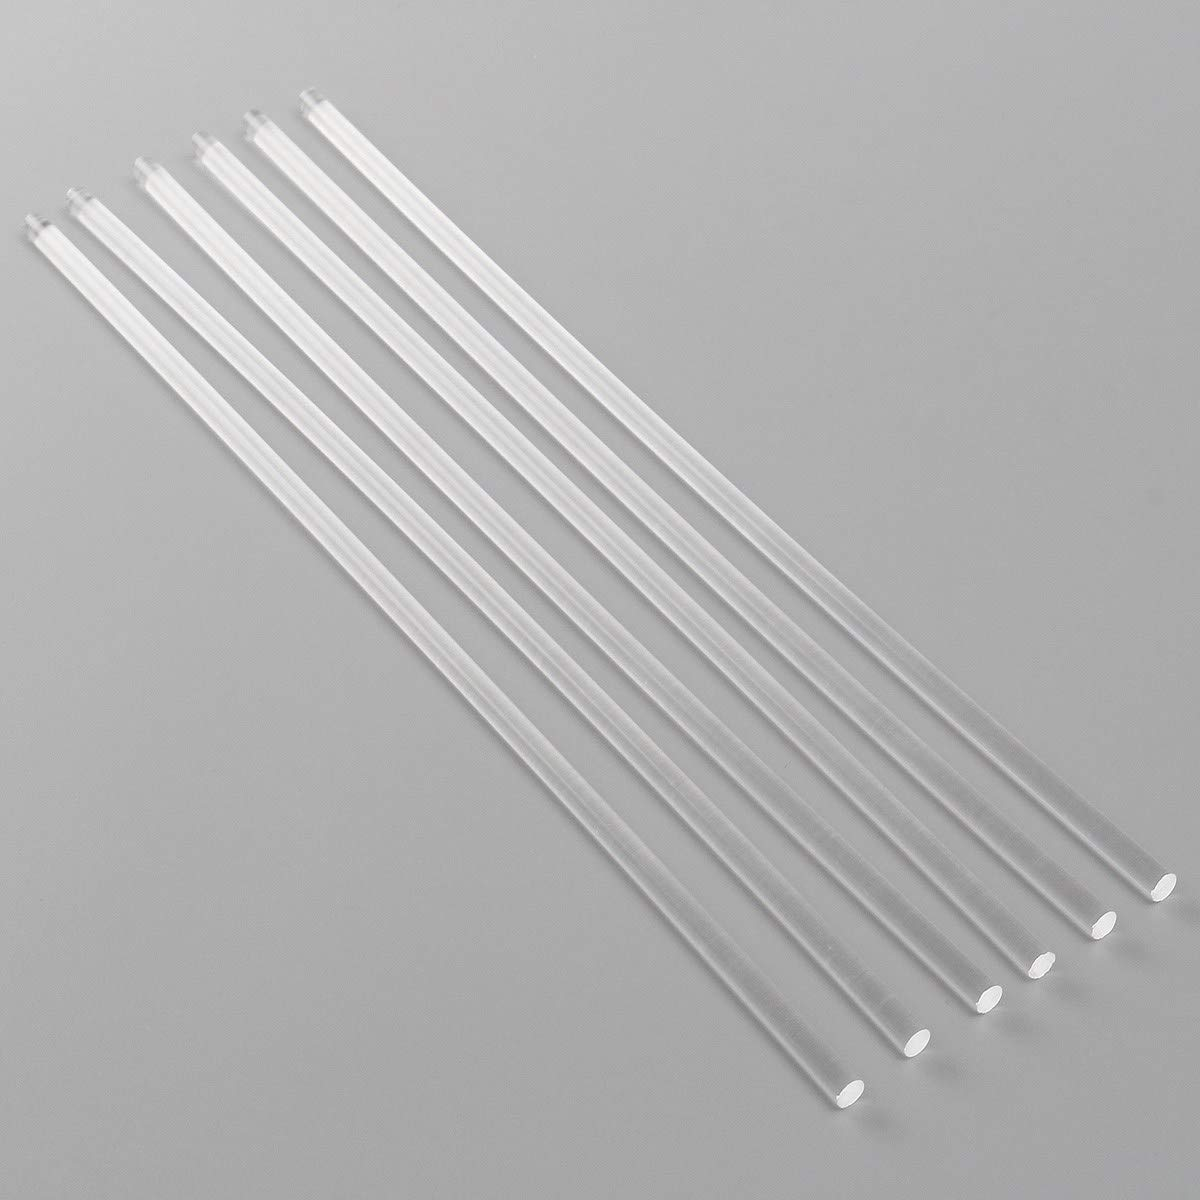 9mm Diameter 300mm Length 2mm-25mm Diameter Transparent Acrylic Round bar PMMA Rod